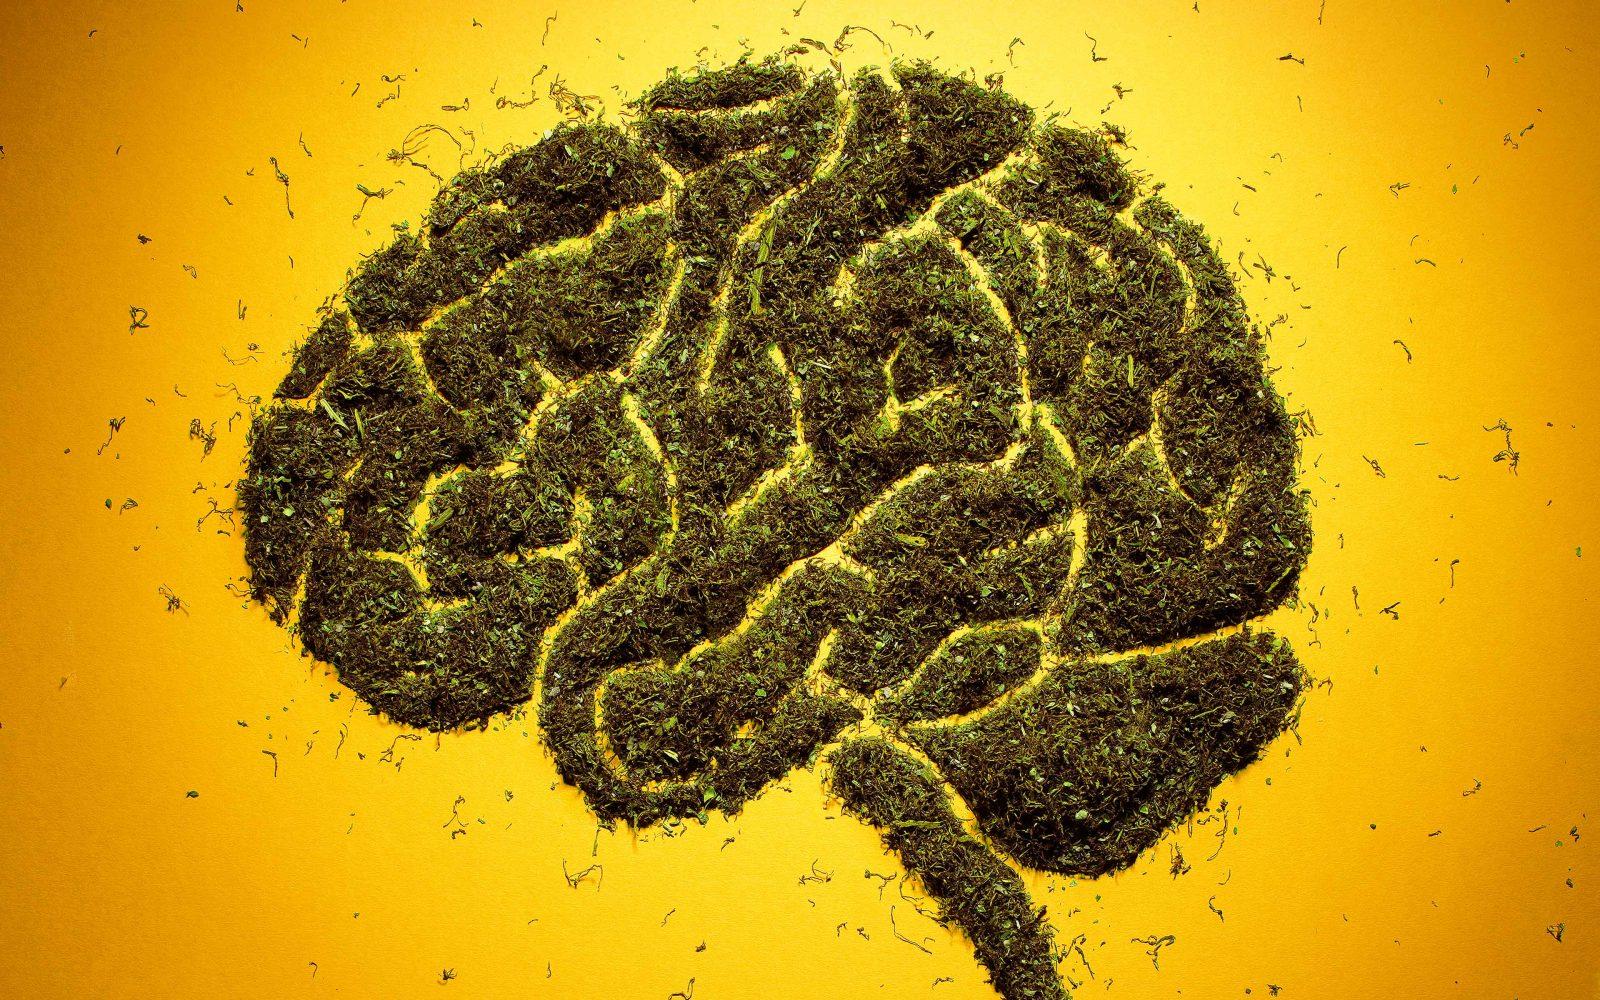 Disminuye riesgo de accidente cerebrovascular con la hierba